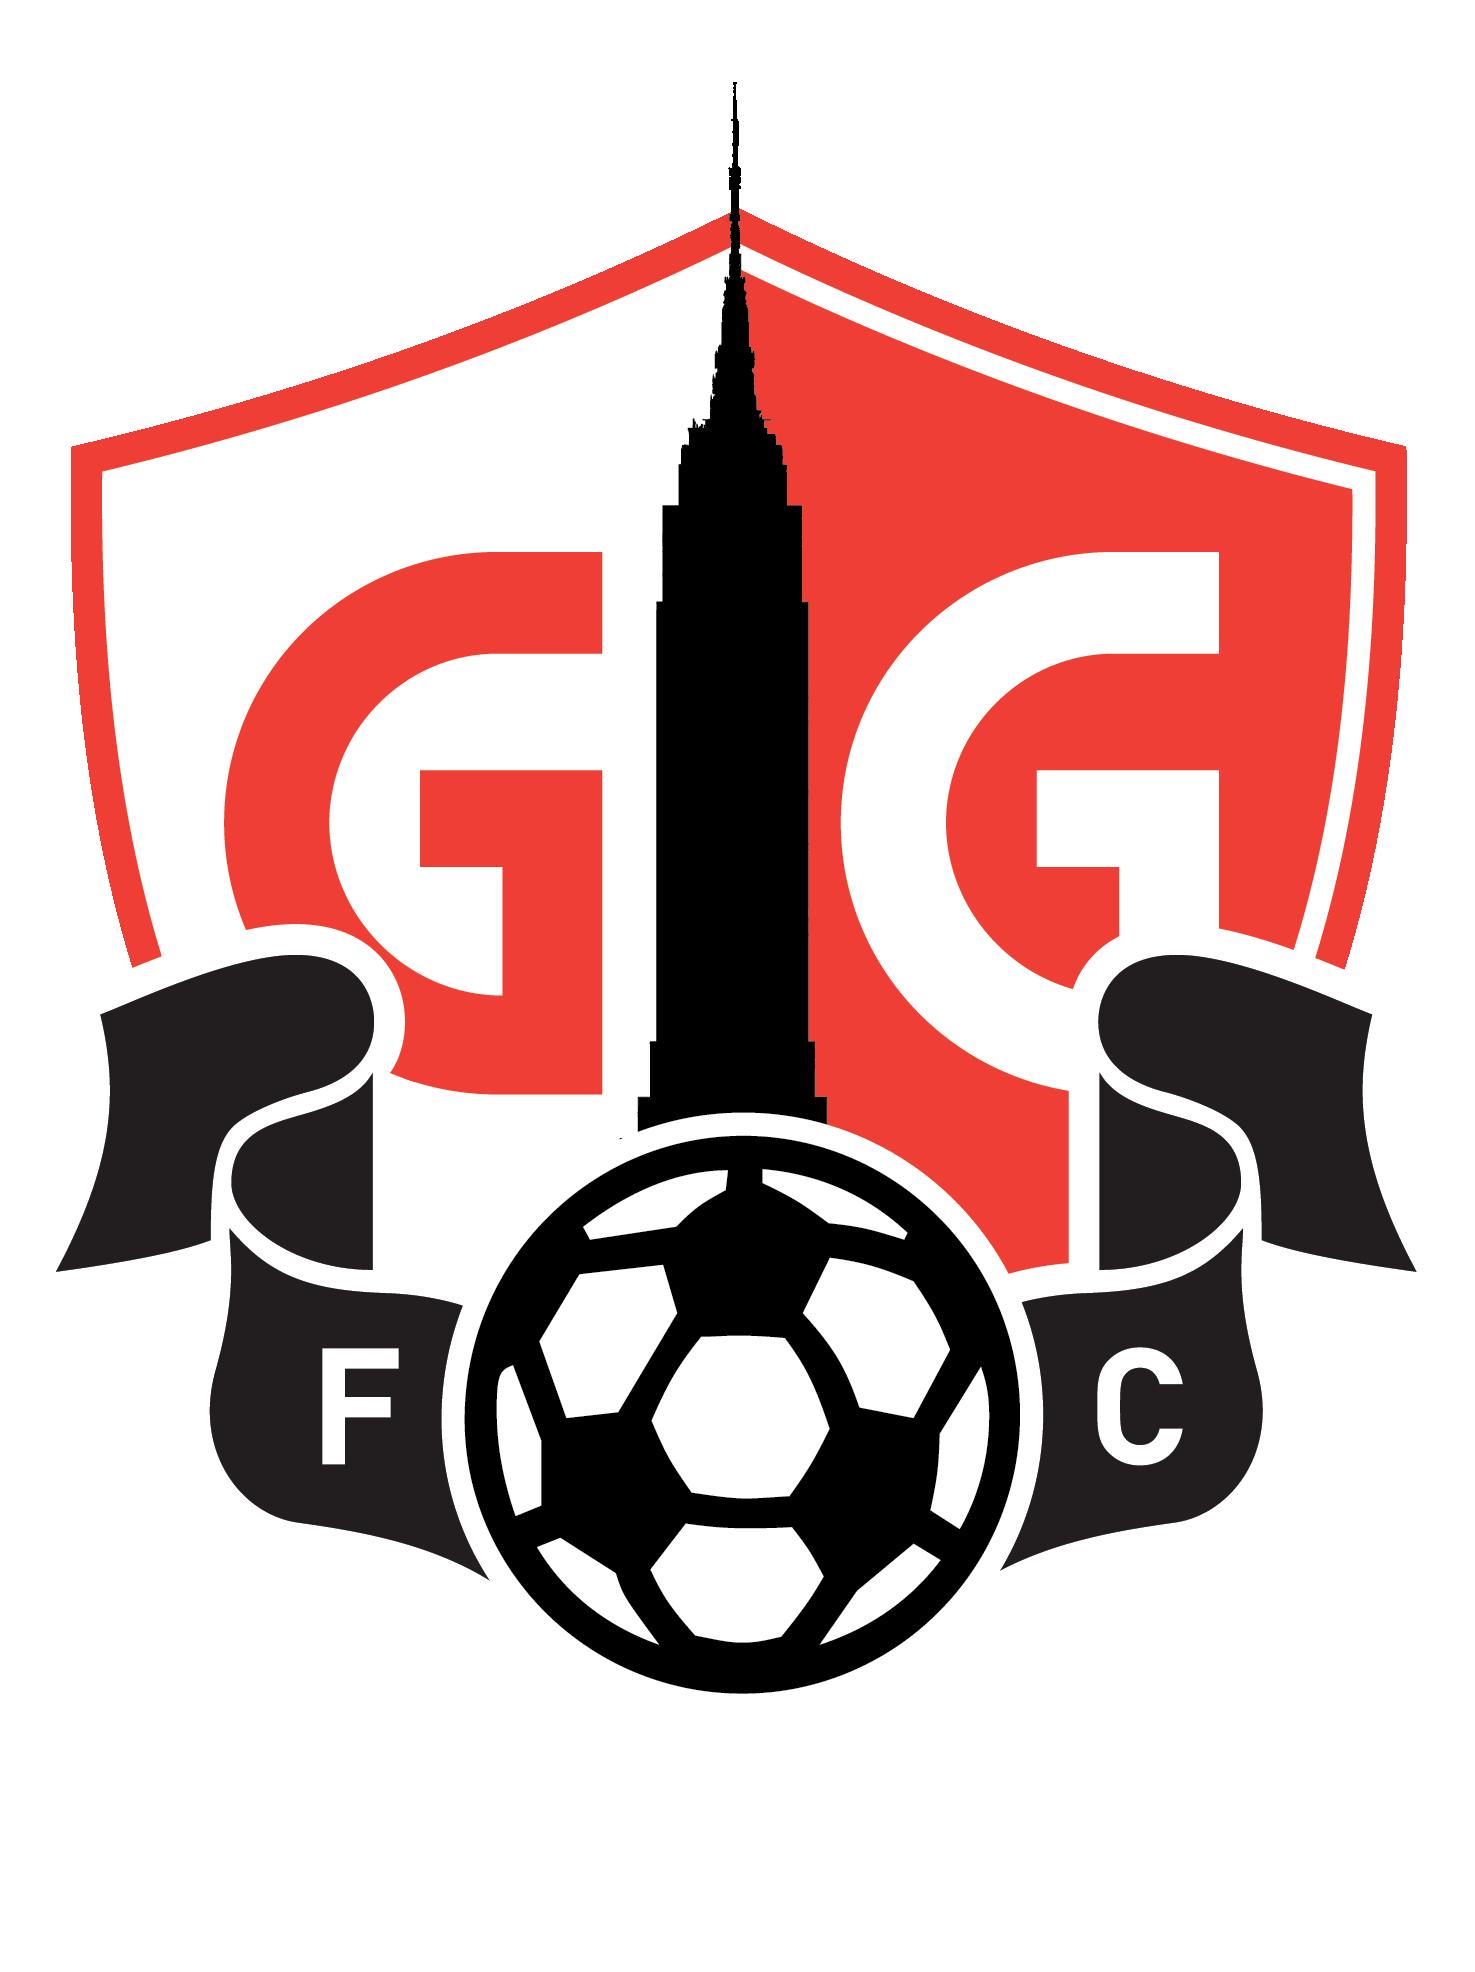 GGFC(2color)-01